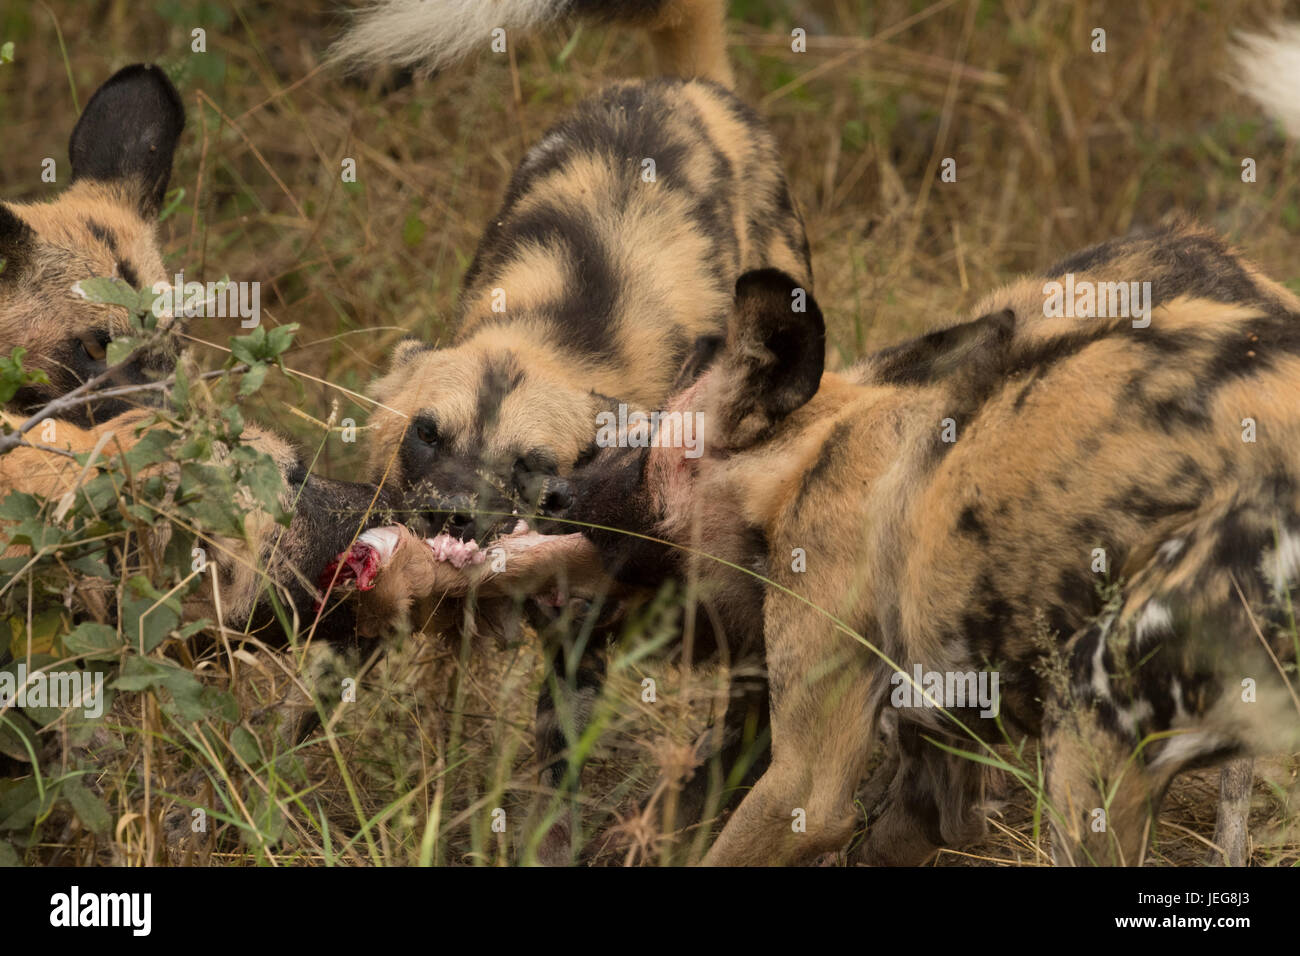 Pack of cape  hunting dogs in the Okavango Delta, Botswana - Stock Image